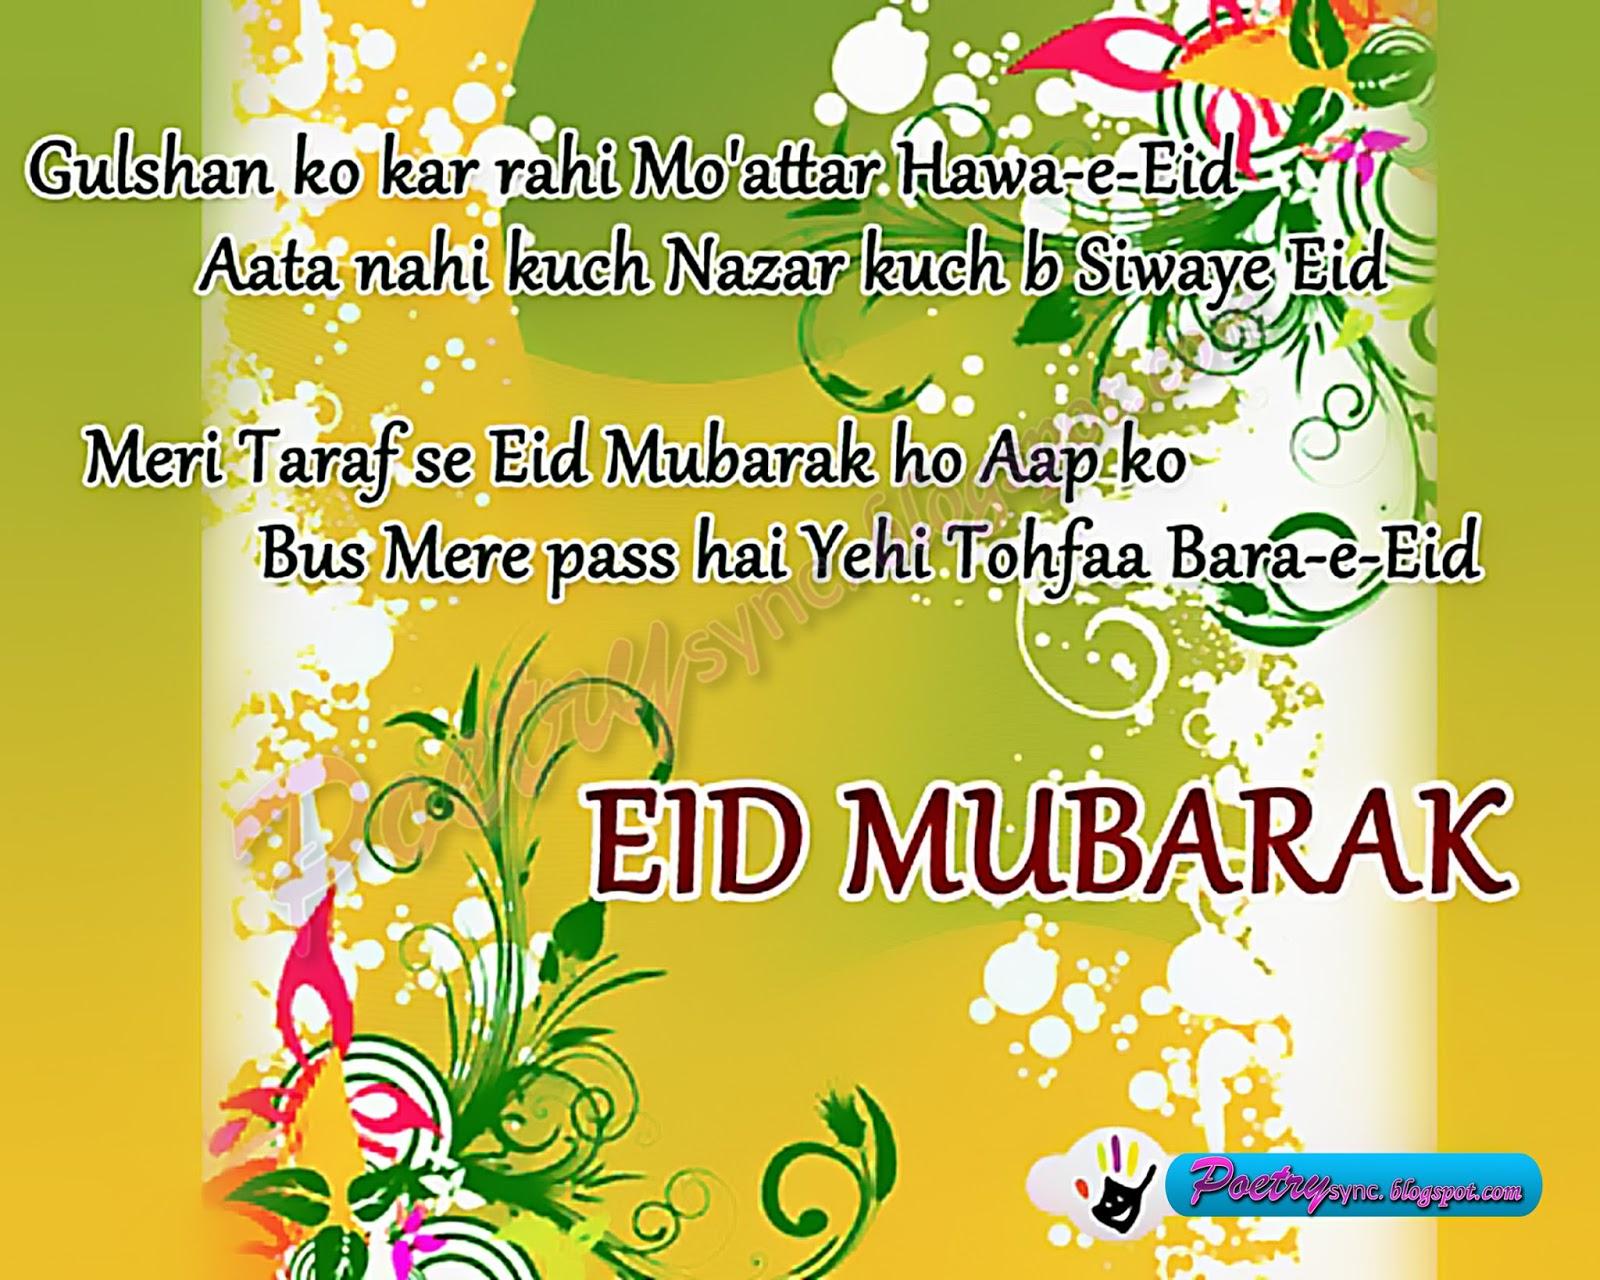 Eid mubarak shayari messageswallpapersin englishurduarabichindi eid mubarak shayari in hindi 2017 kristyandbryce Images